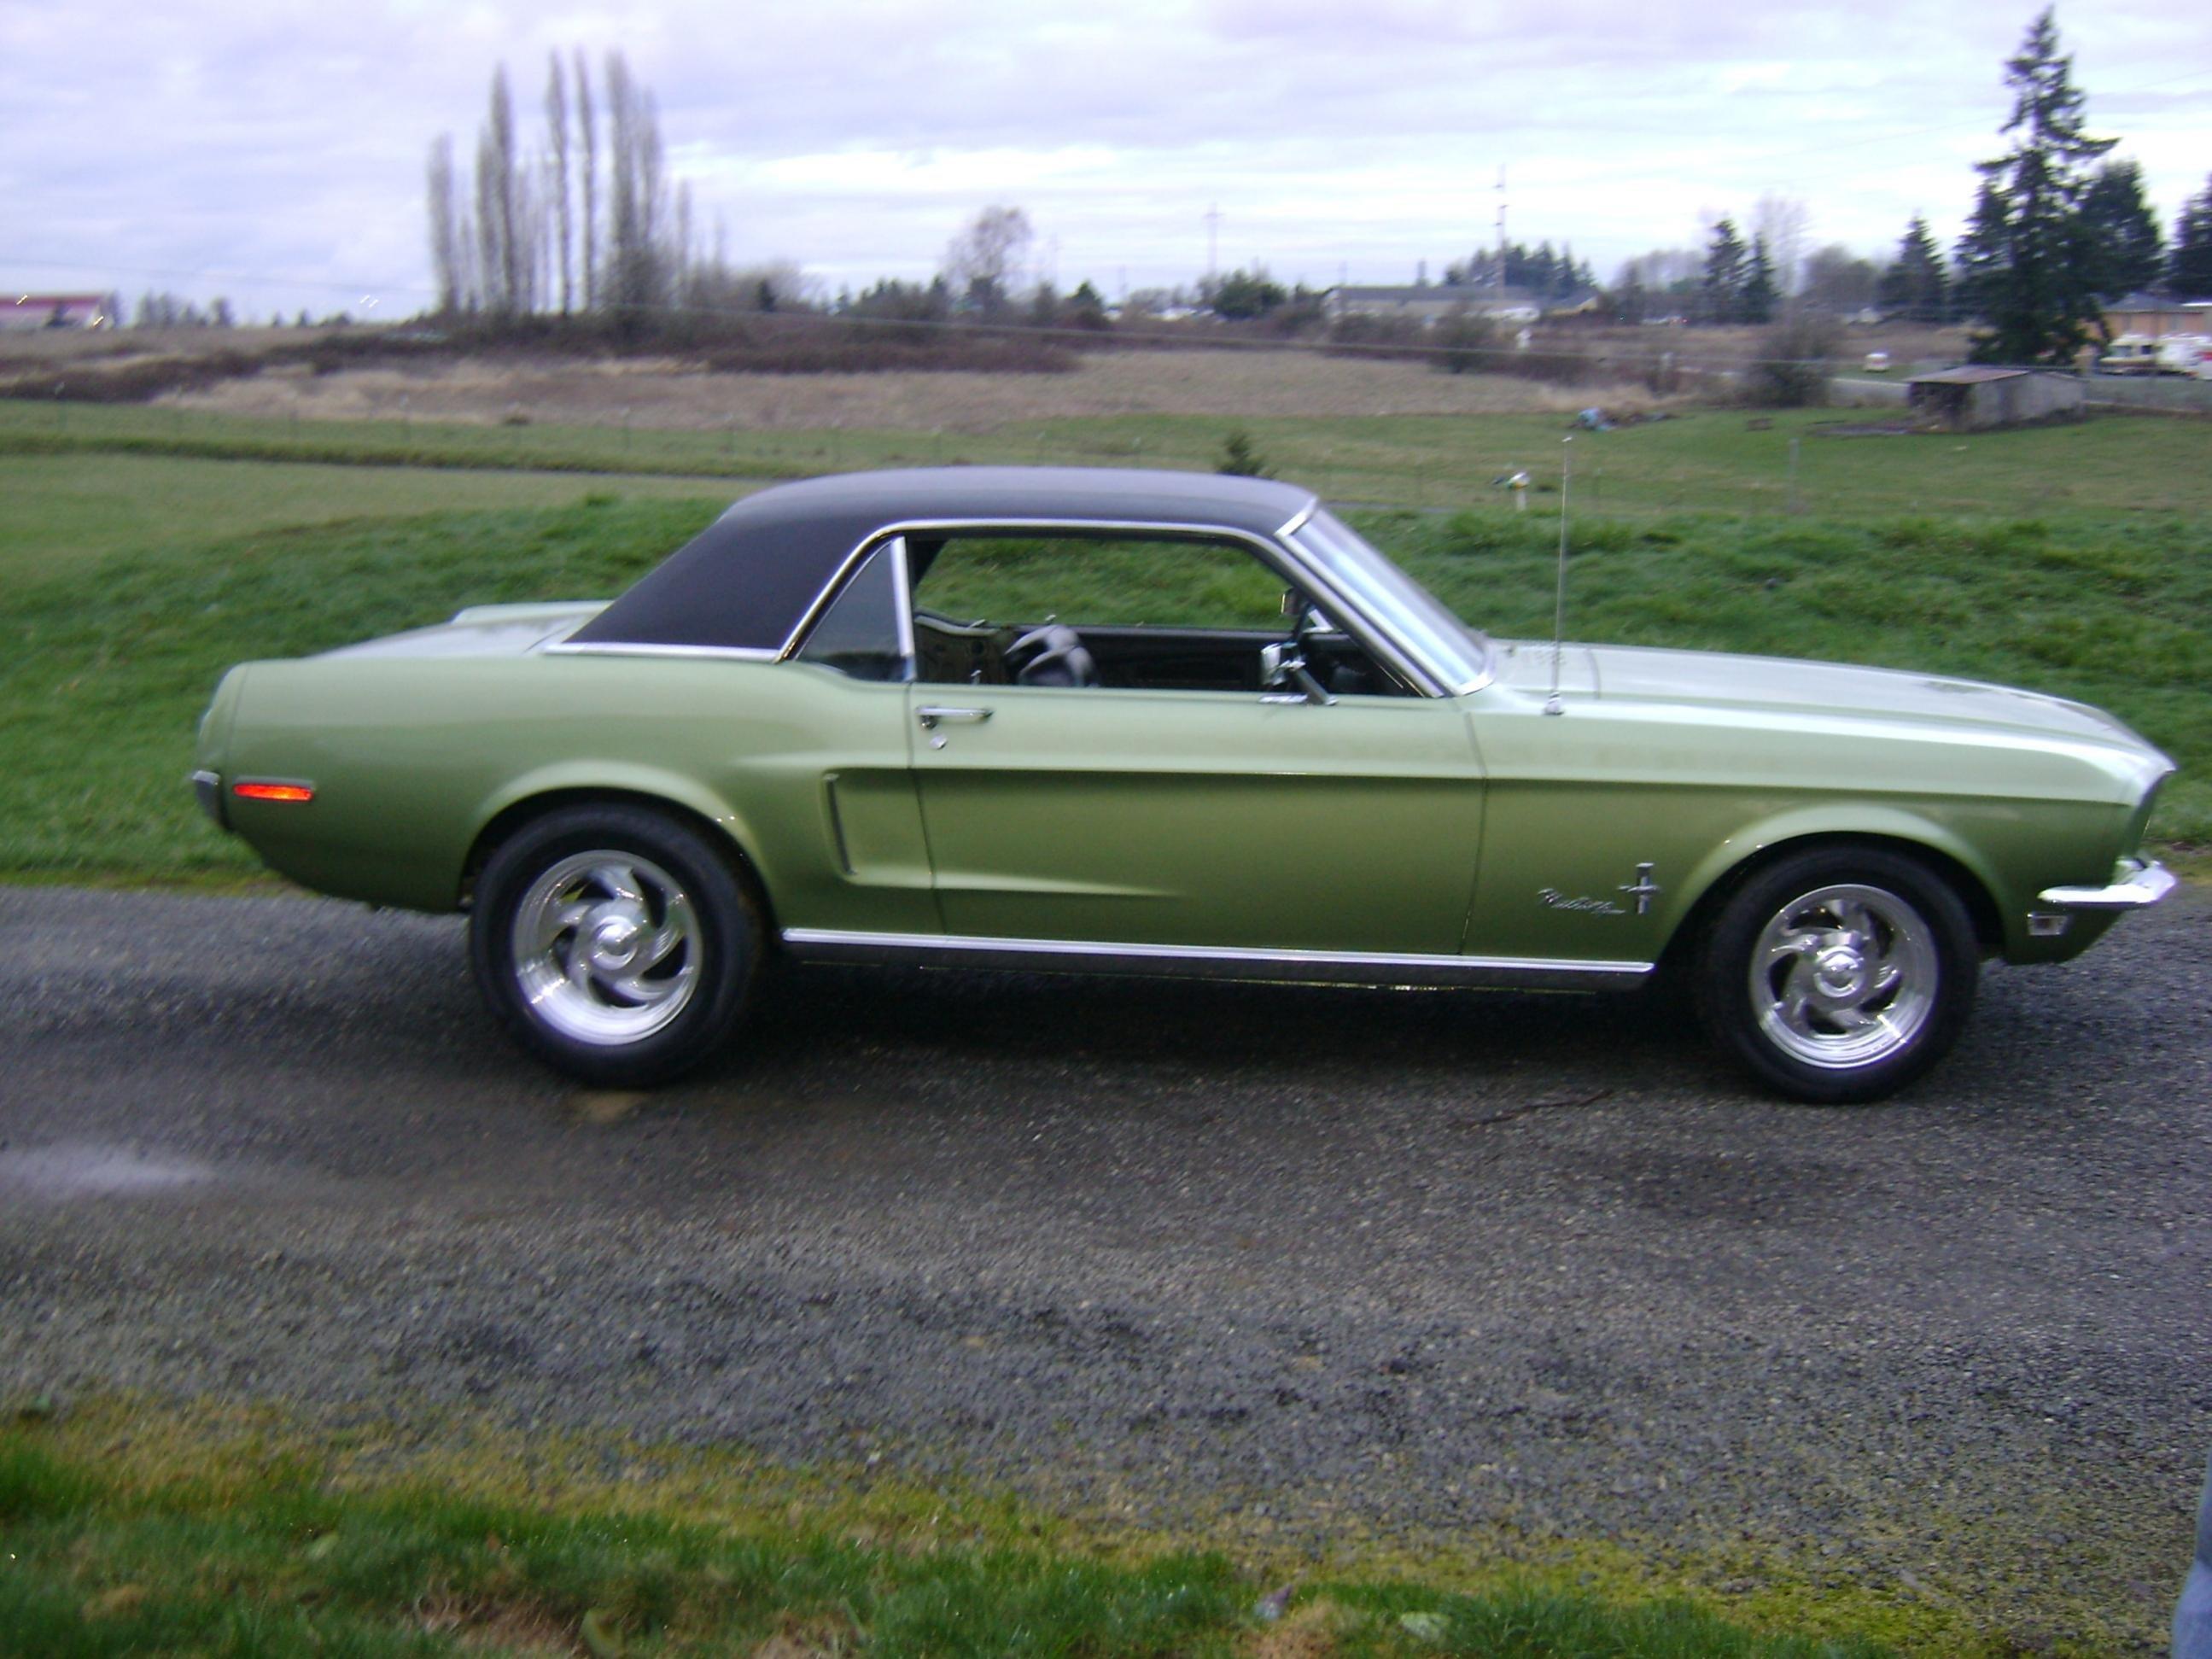 1968 Mustang Finished Restoration